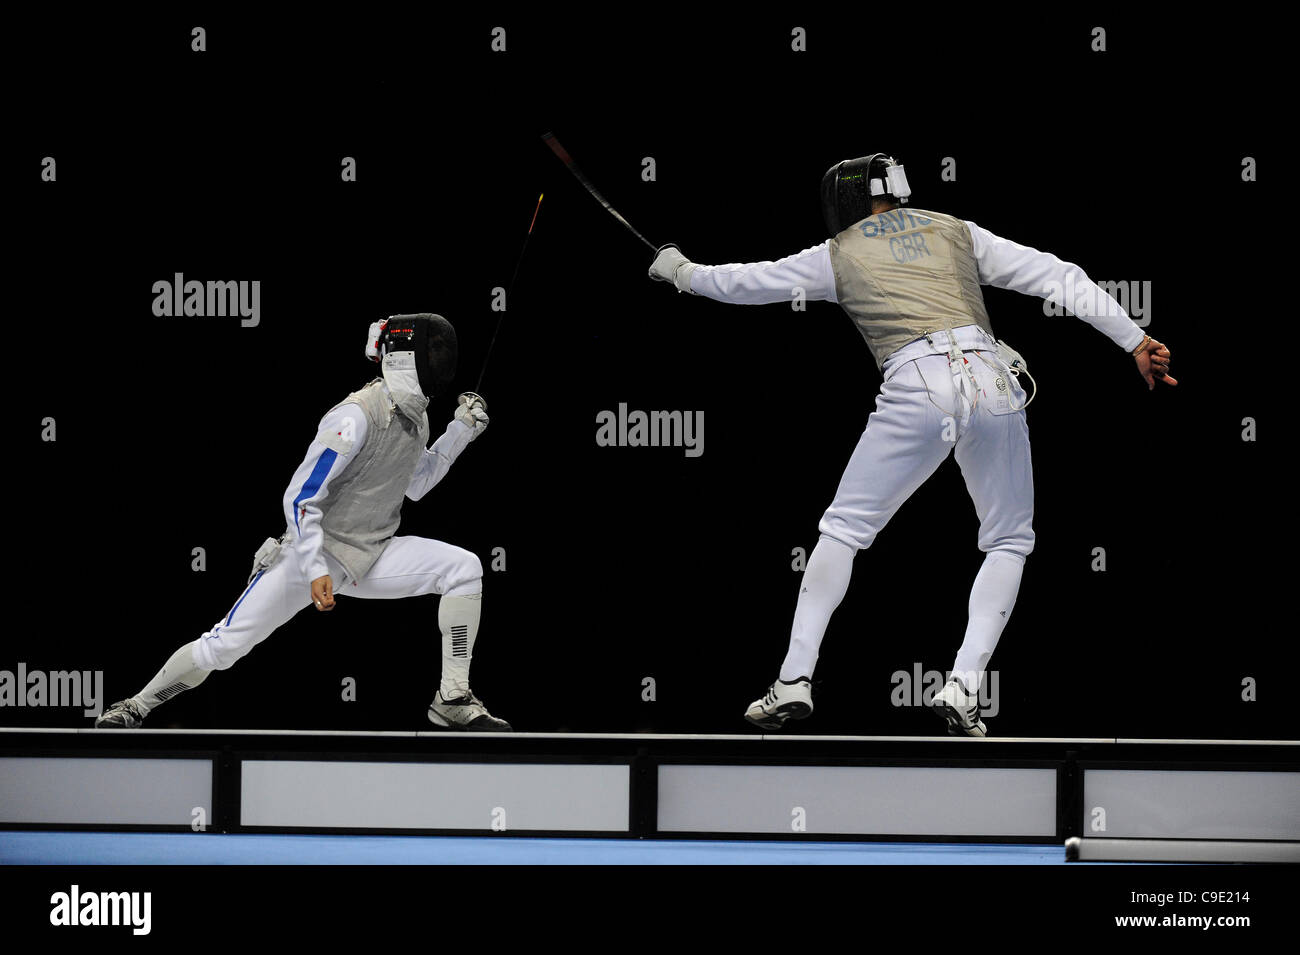 Brice GUYART (FRA) [sinistra] v Keith COOK (GBR) [destra] durante l'uomo foil concorrenza a Londra prepara Olympic Immagini Stock